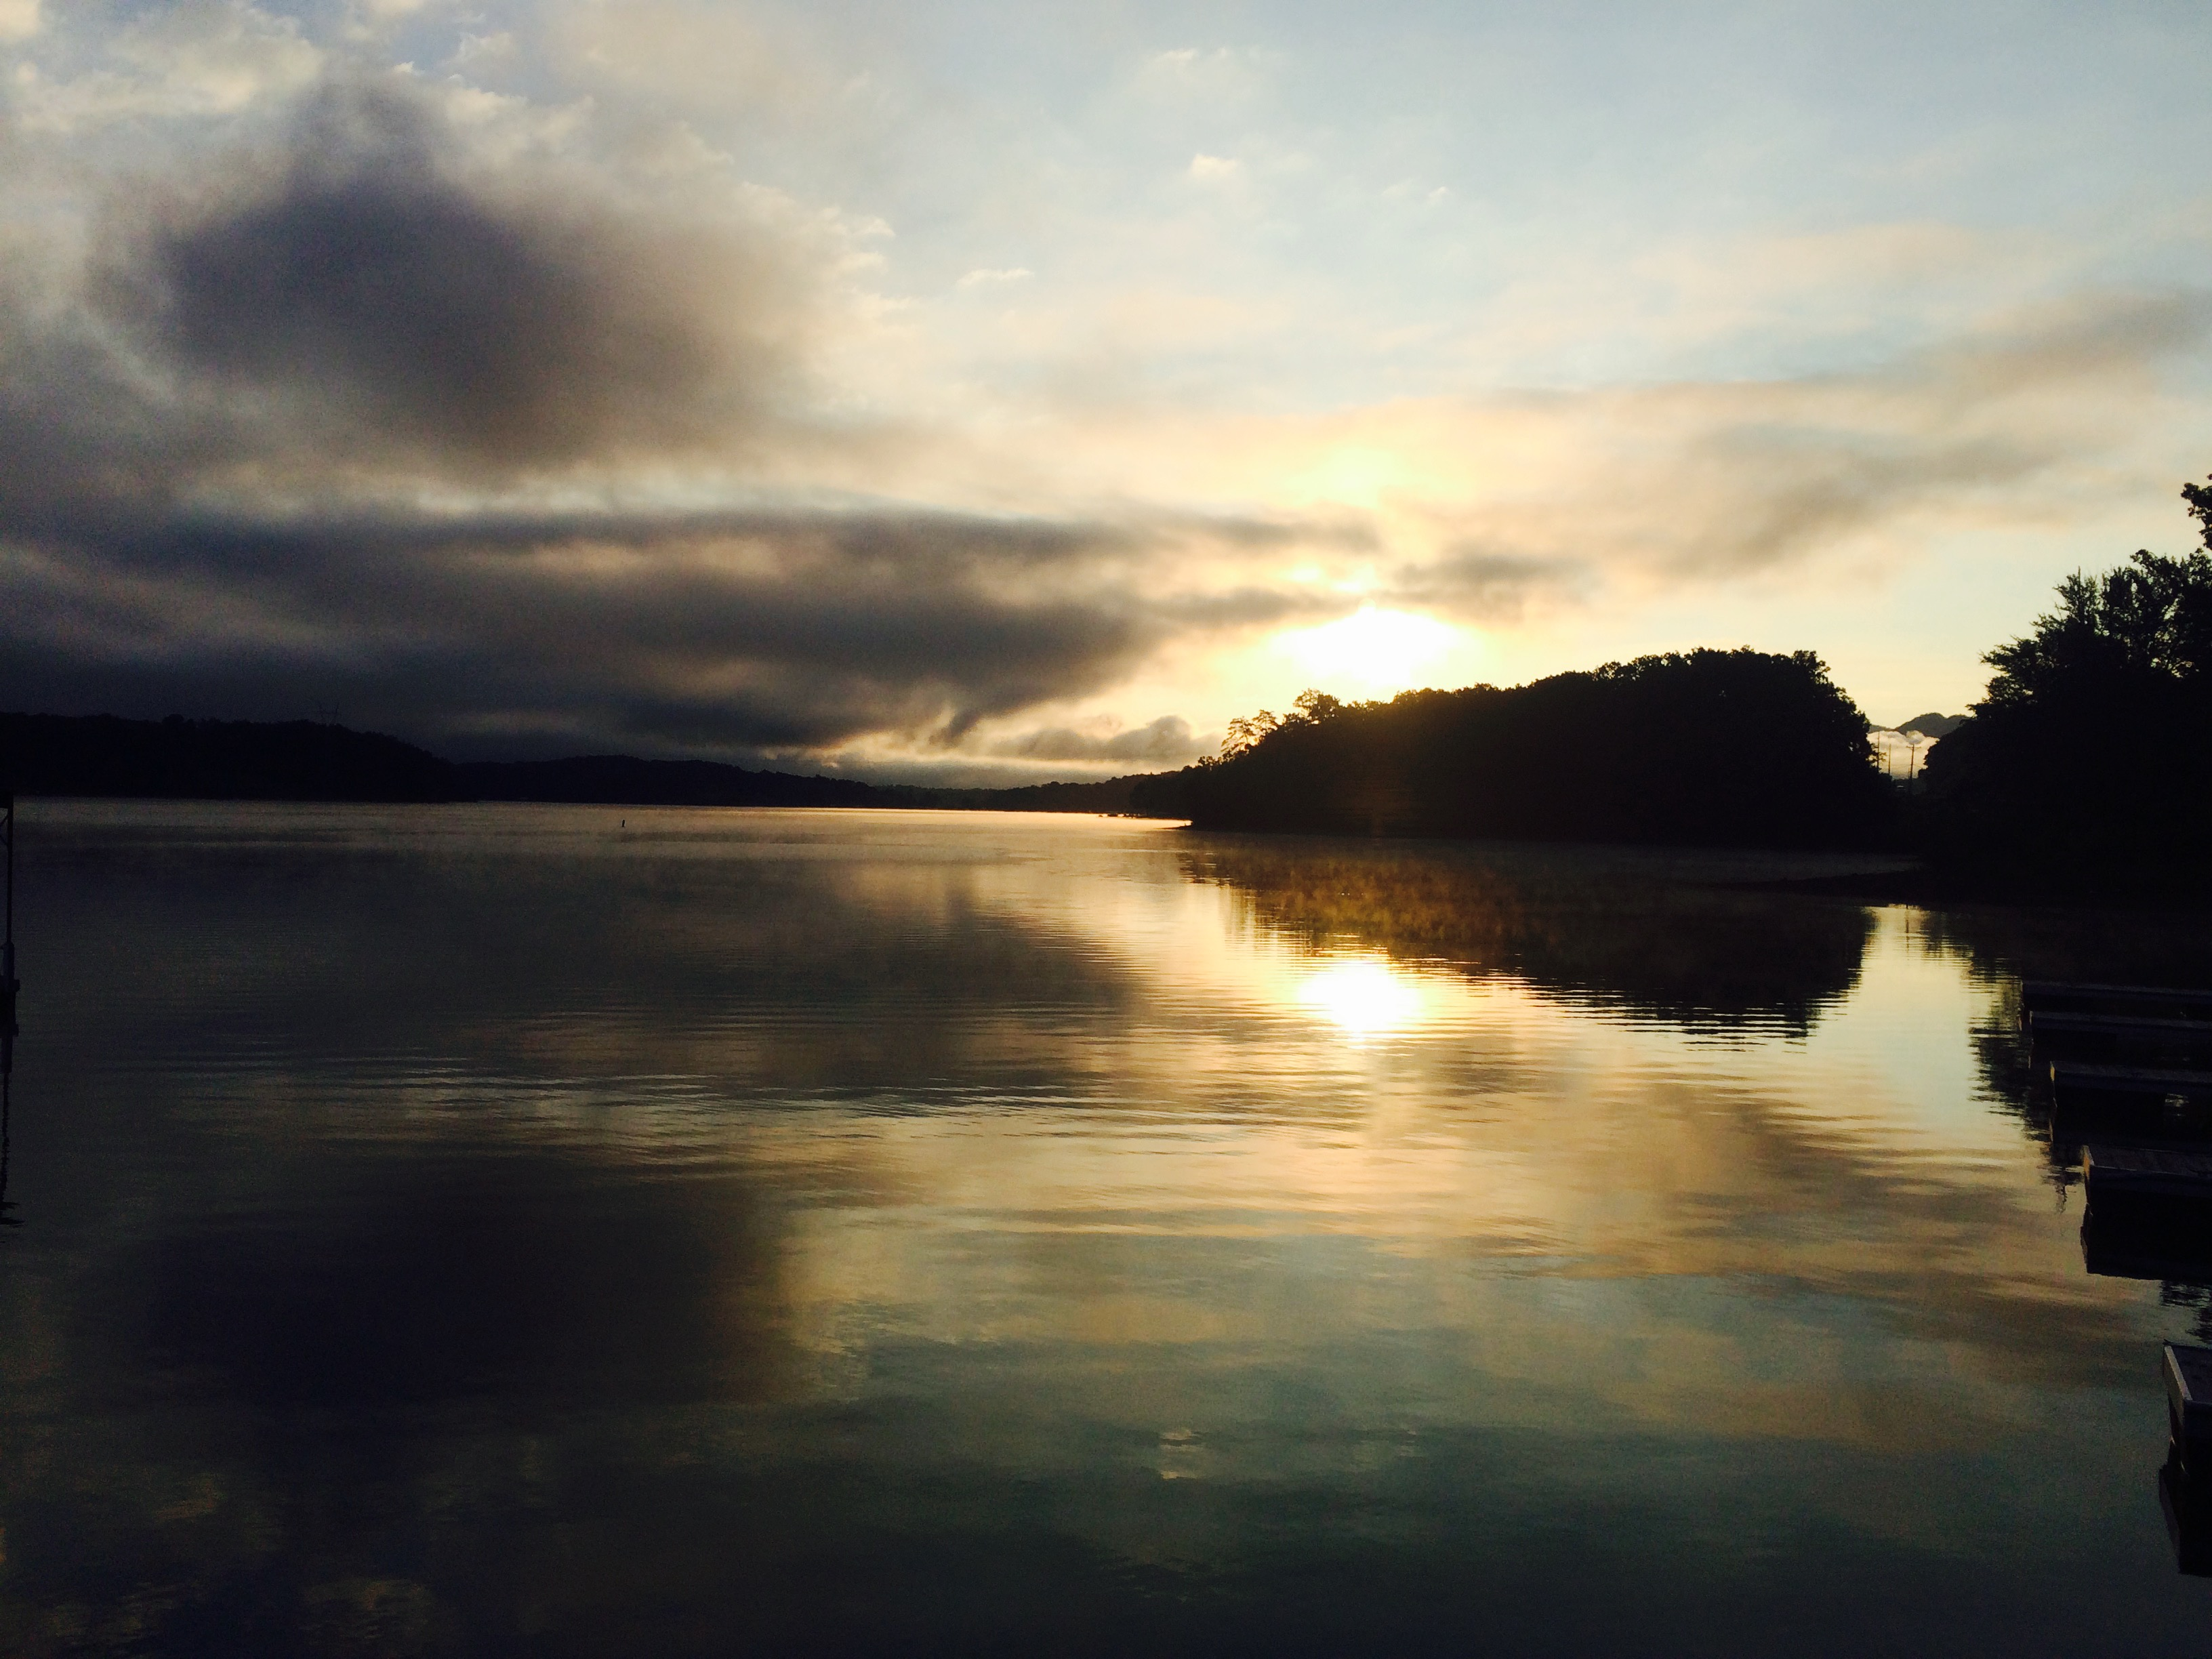 A sunset over a calm lake.